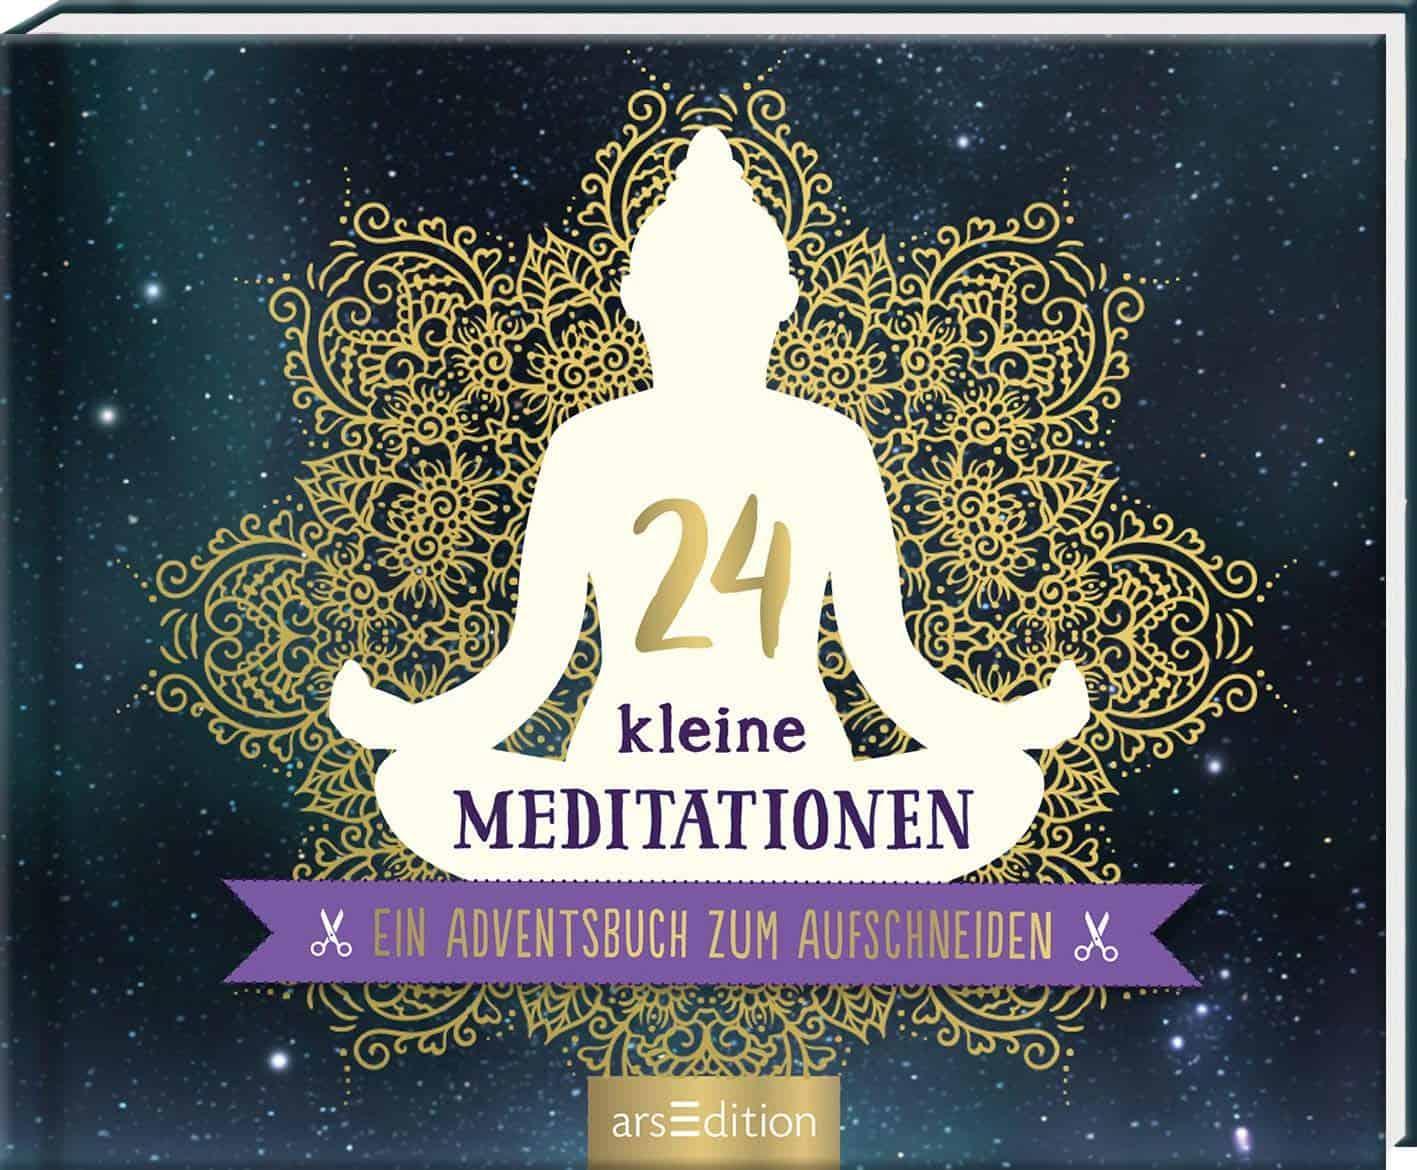 Yoga-Adventskalender Übersicht 2021